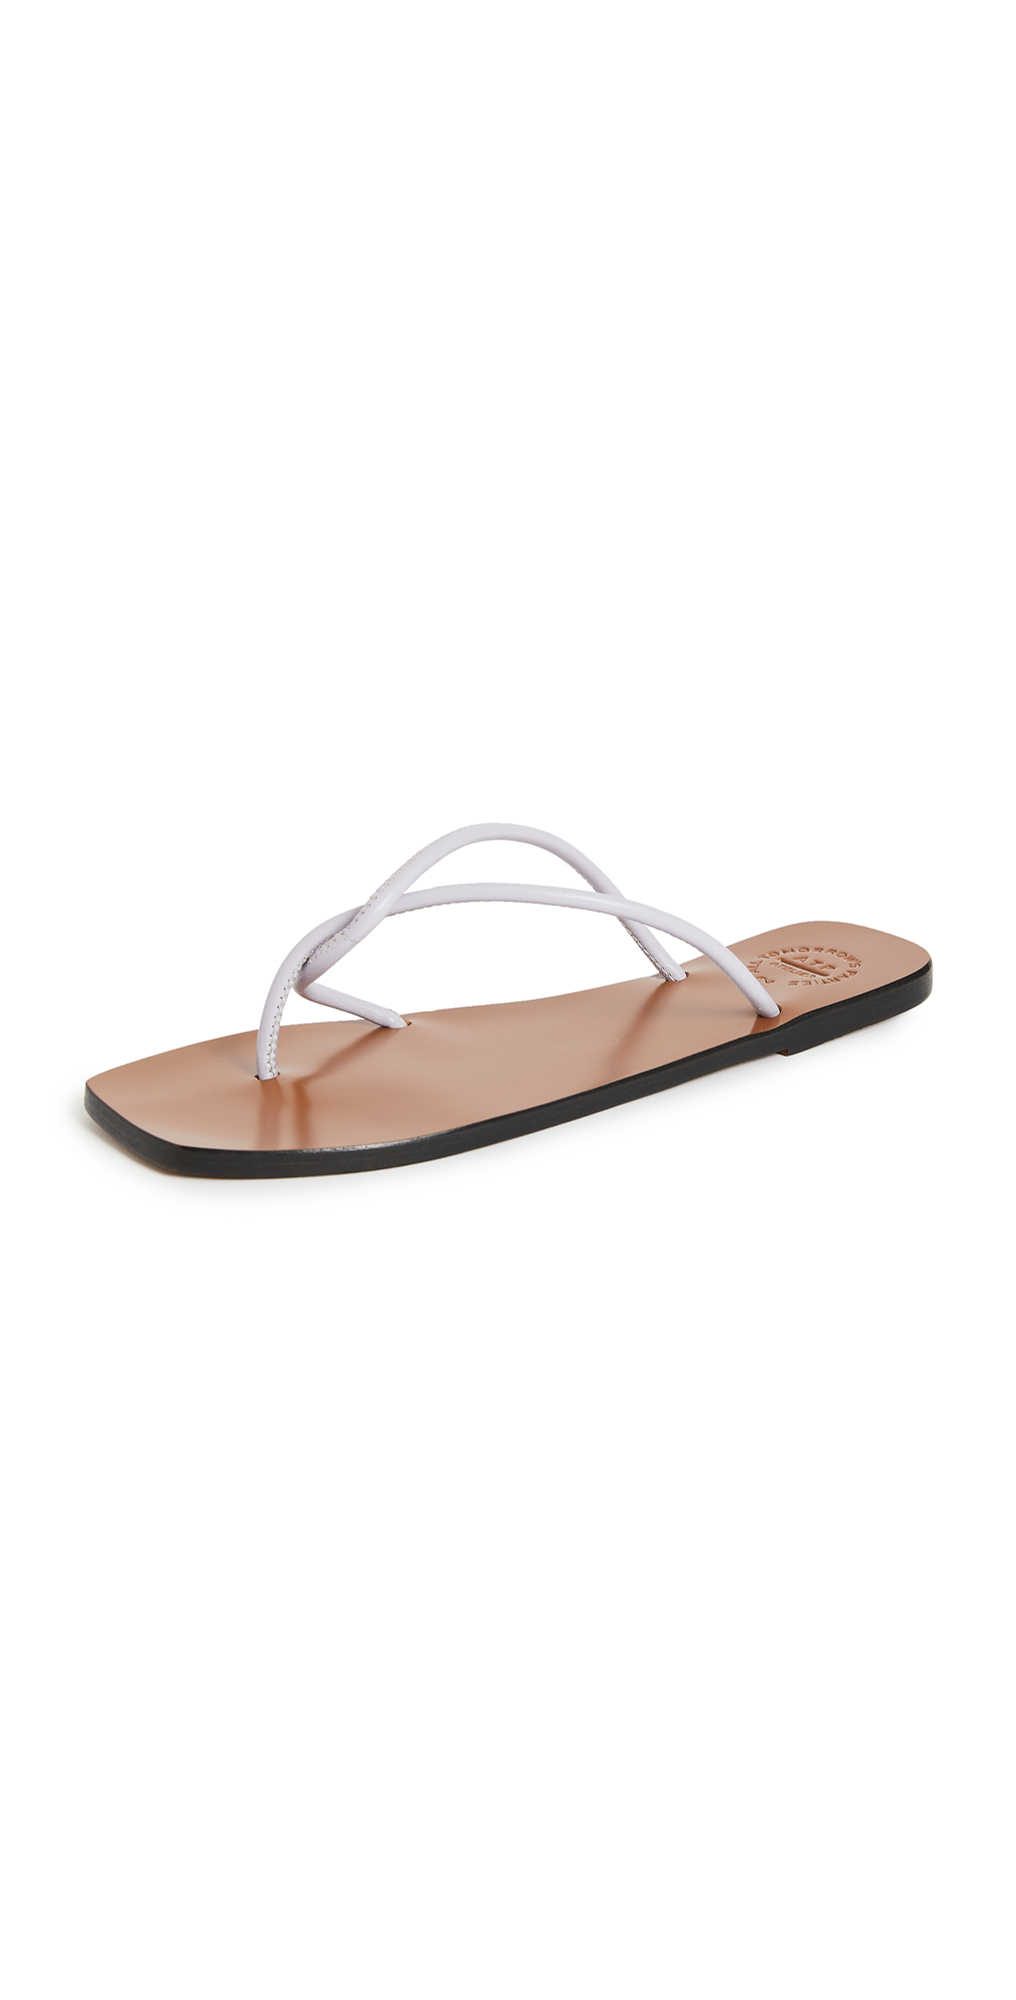 ATP Atelier Alessano Sandals